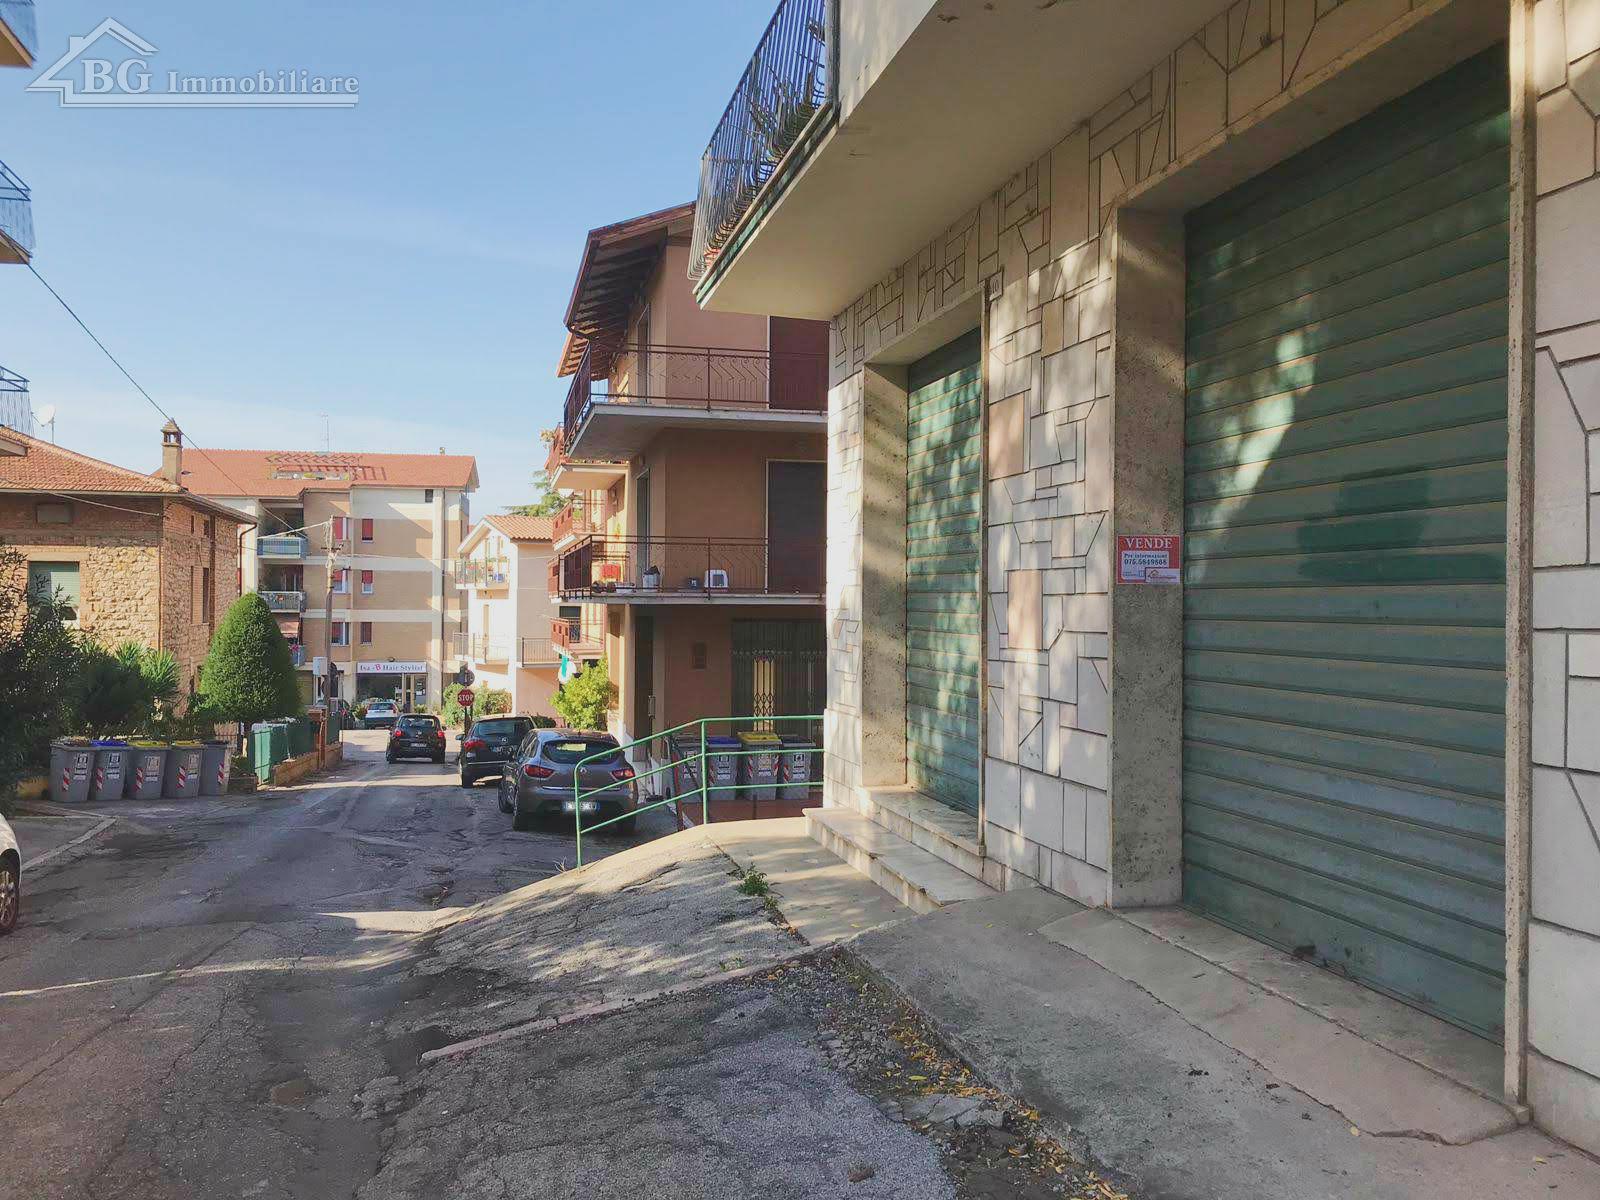 BOX - GARAGE VENDITA PERUGIA STAZIONE